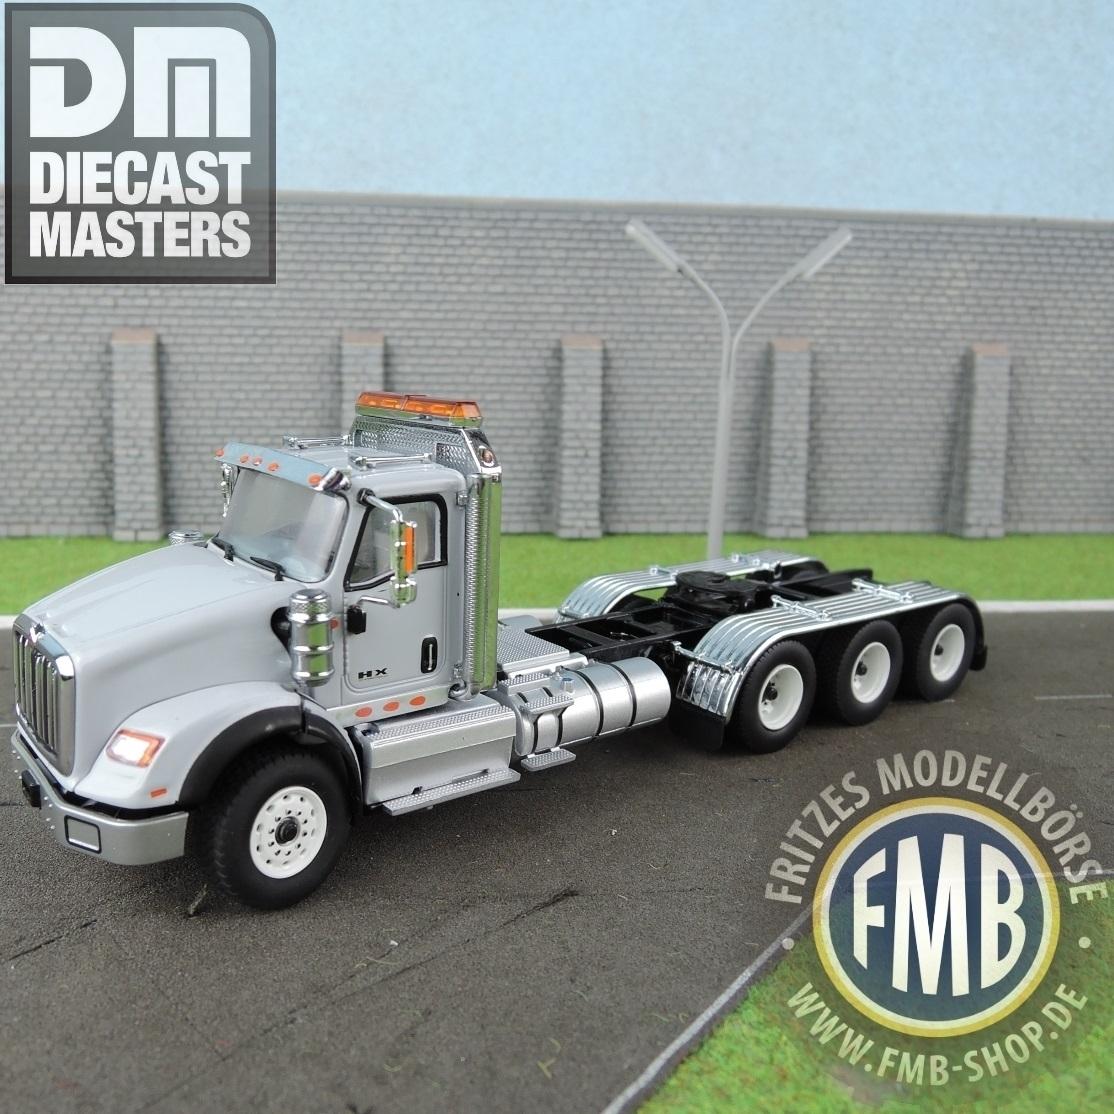 71011 - Diecast Masters - International HX620 4axle truck tractor, light  grey